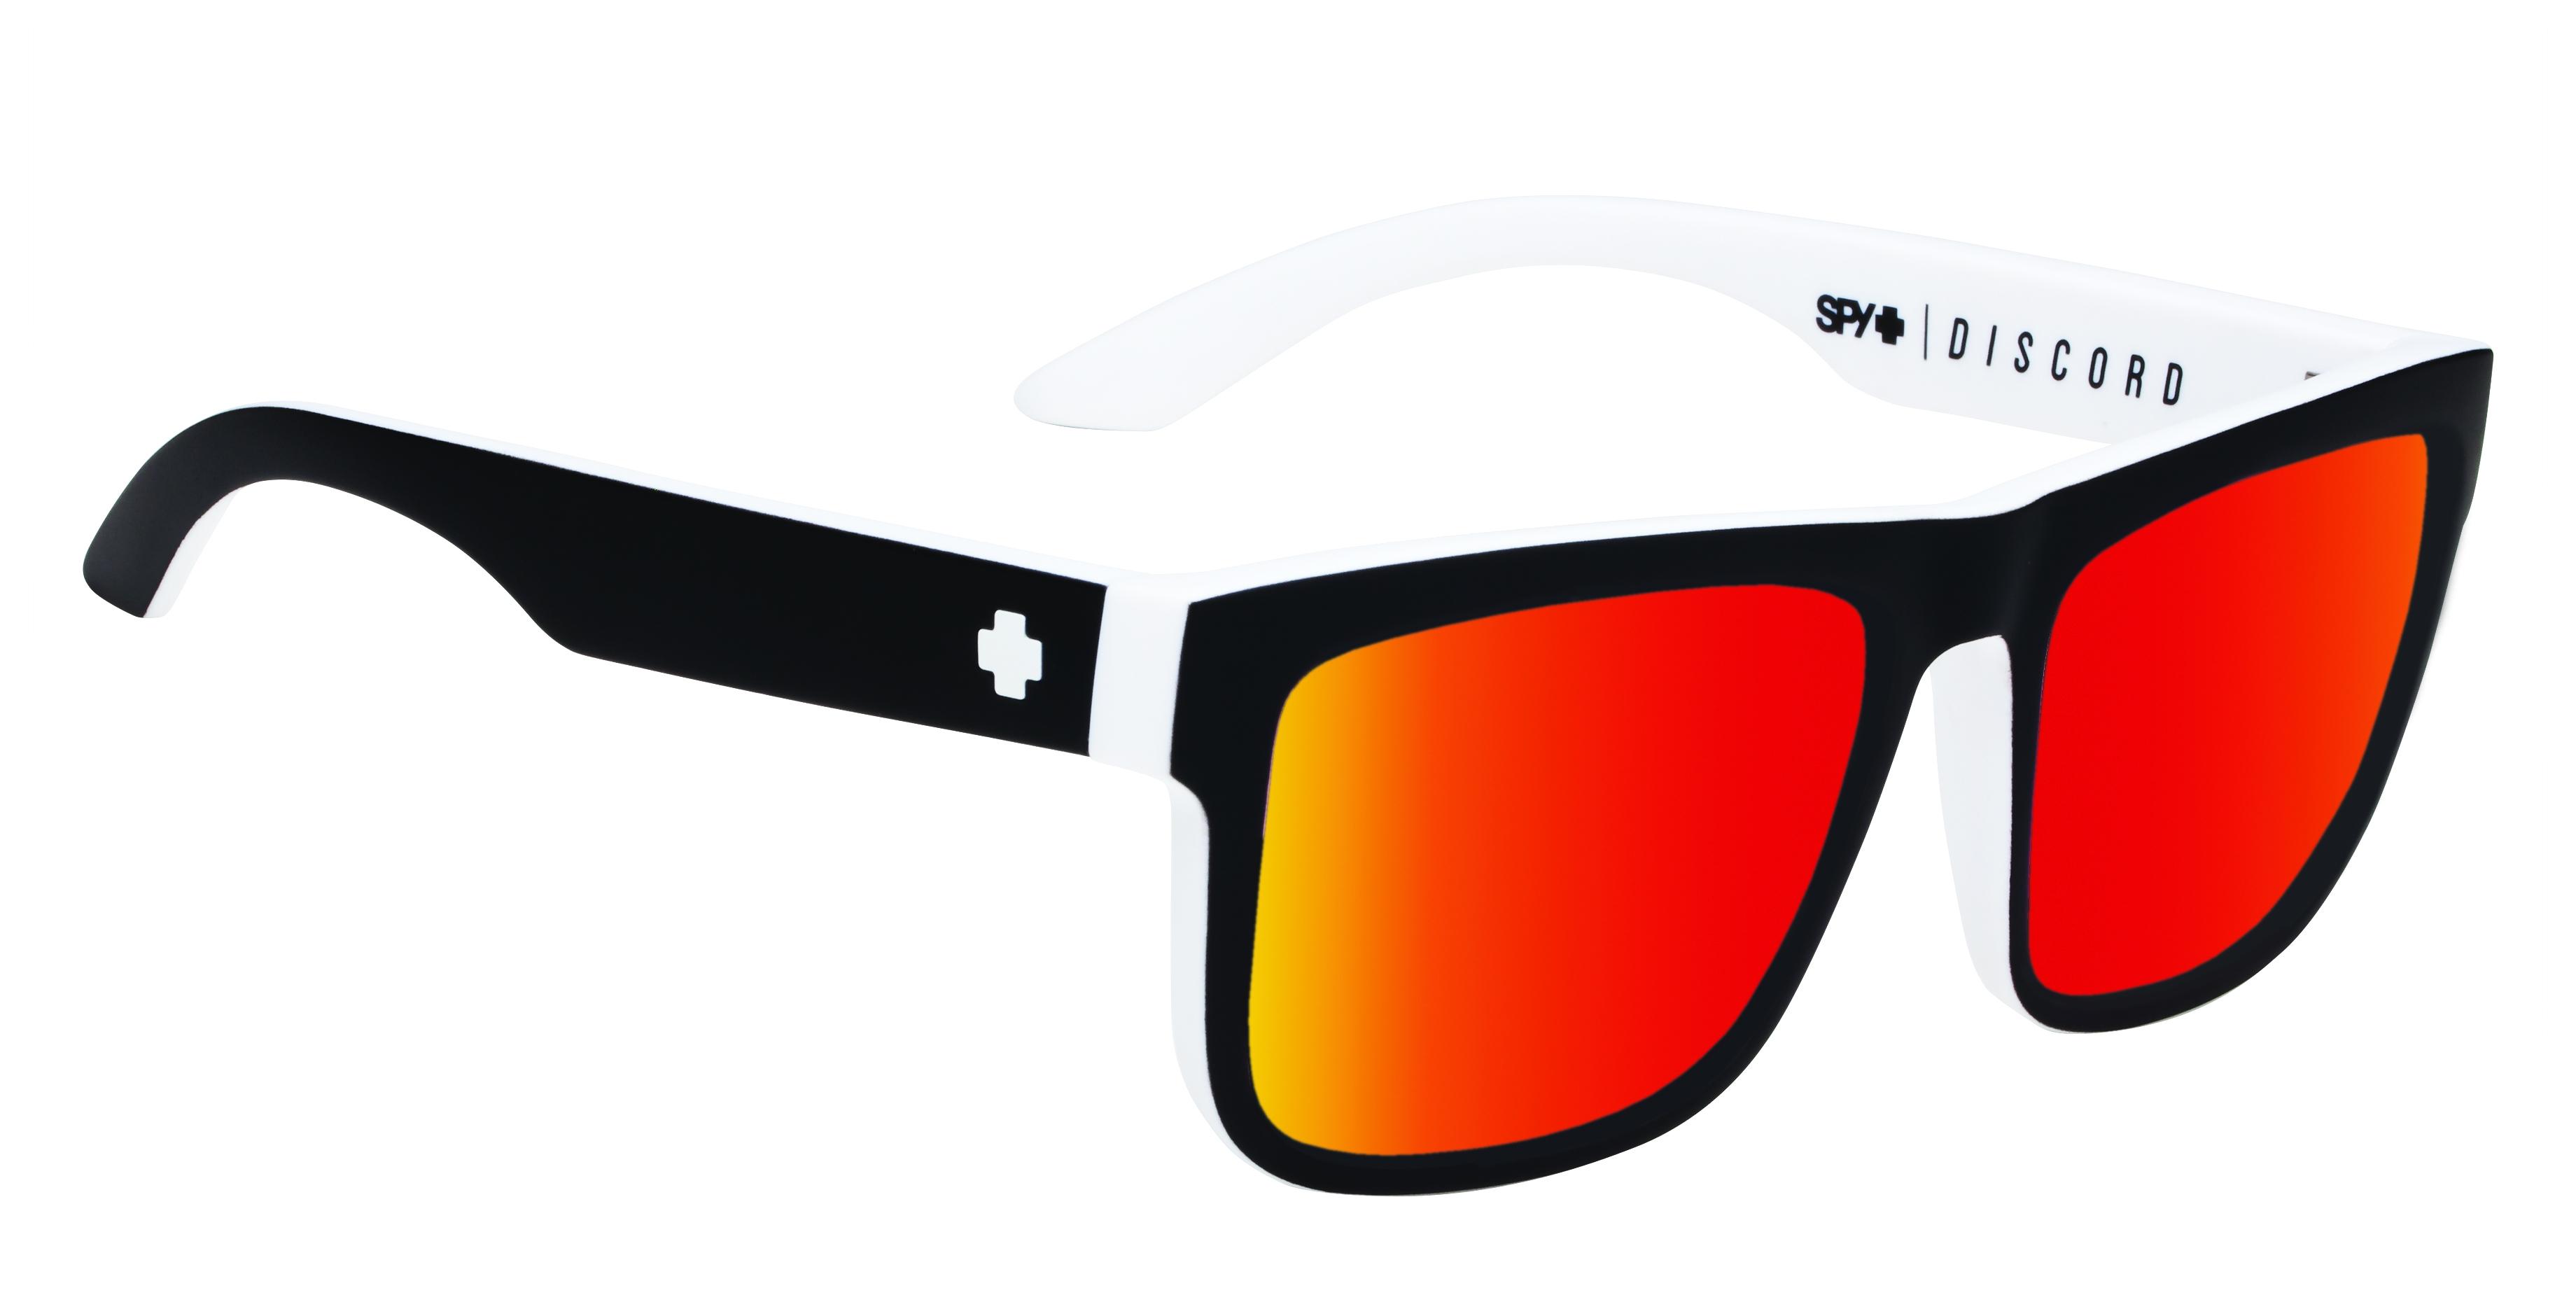 2018 Triumph Street Triple Rs Review Revzilla 2013 Honda Big Red 700 Fuse Diagram 16995 Spy Discord Sunglasses